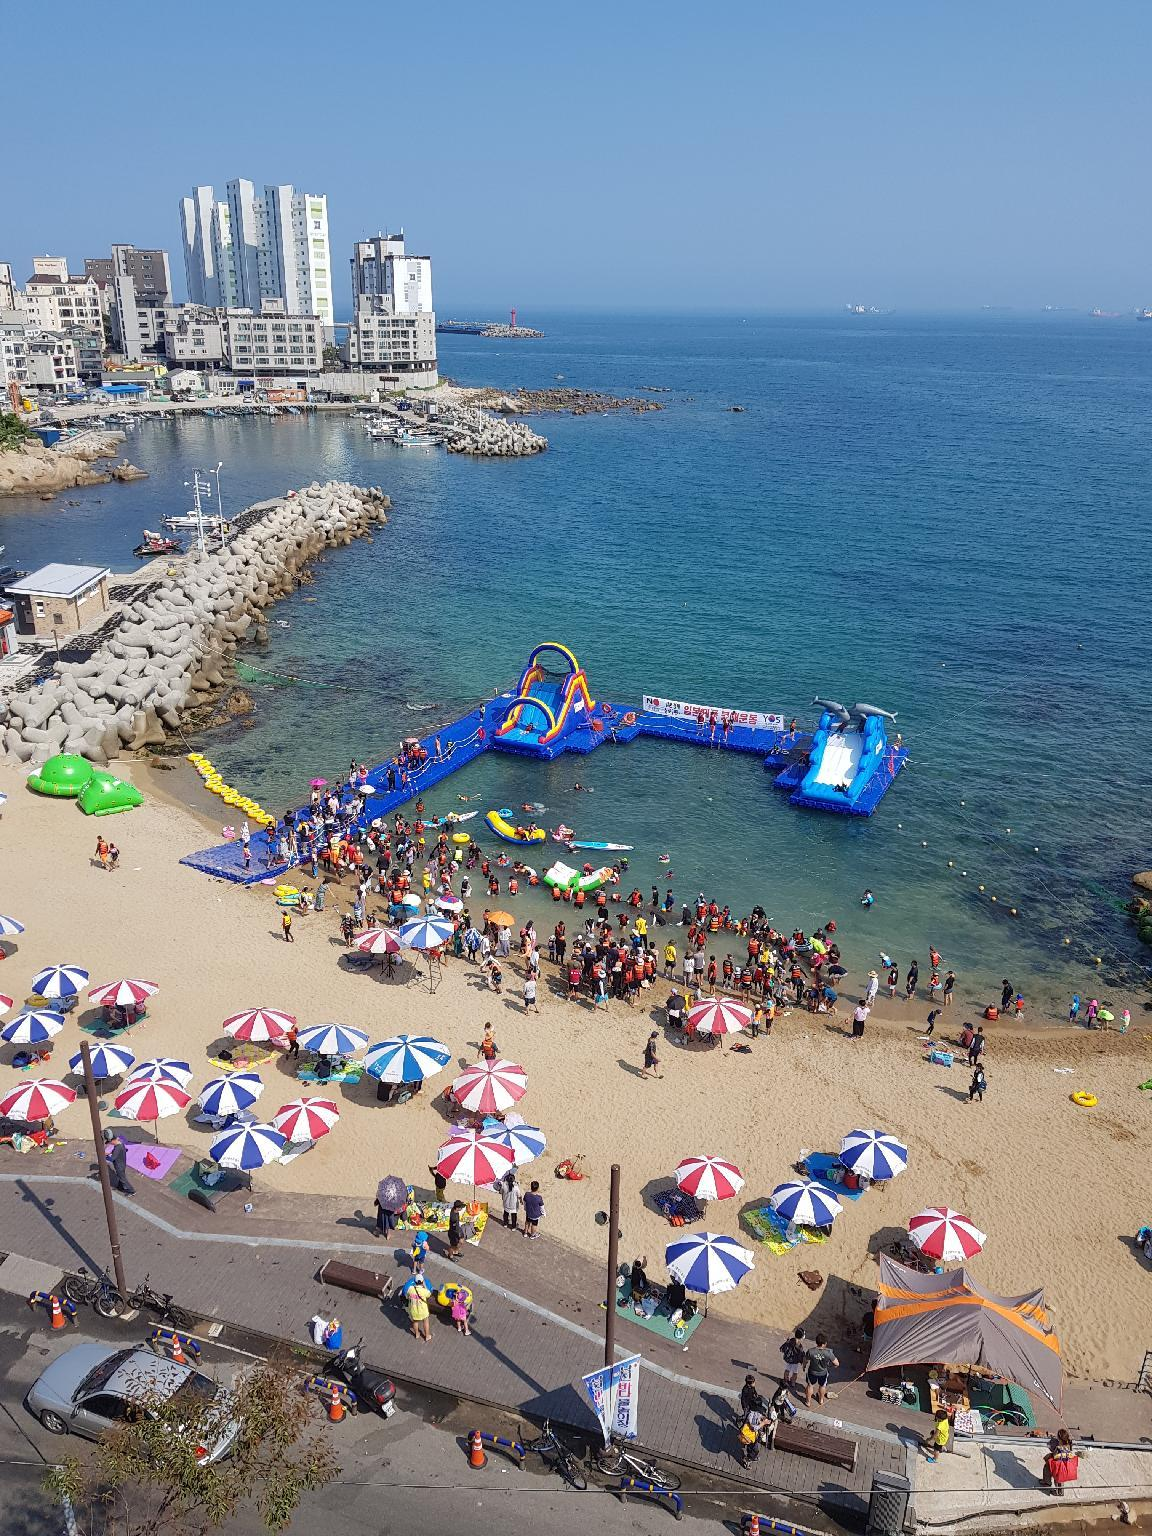 Bangeojin Seaside Beach Front Apartment